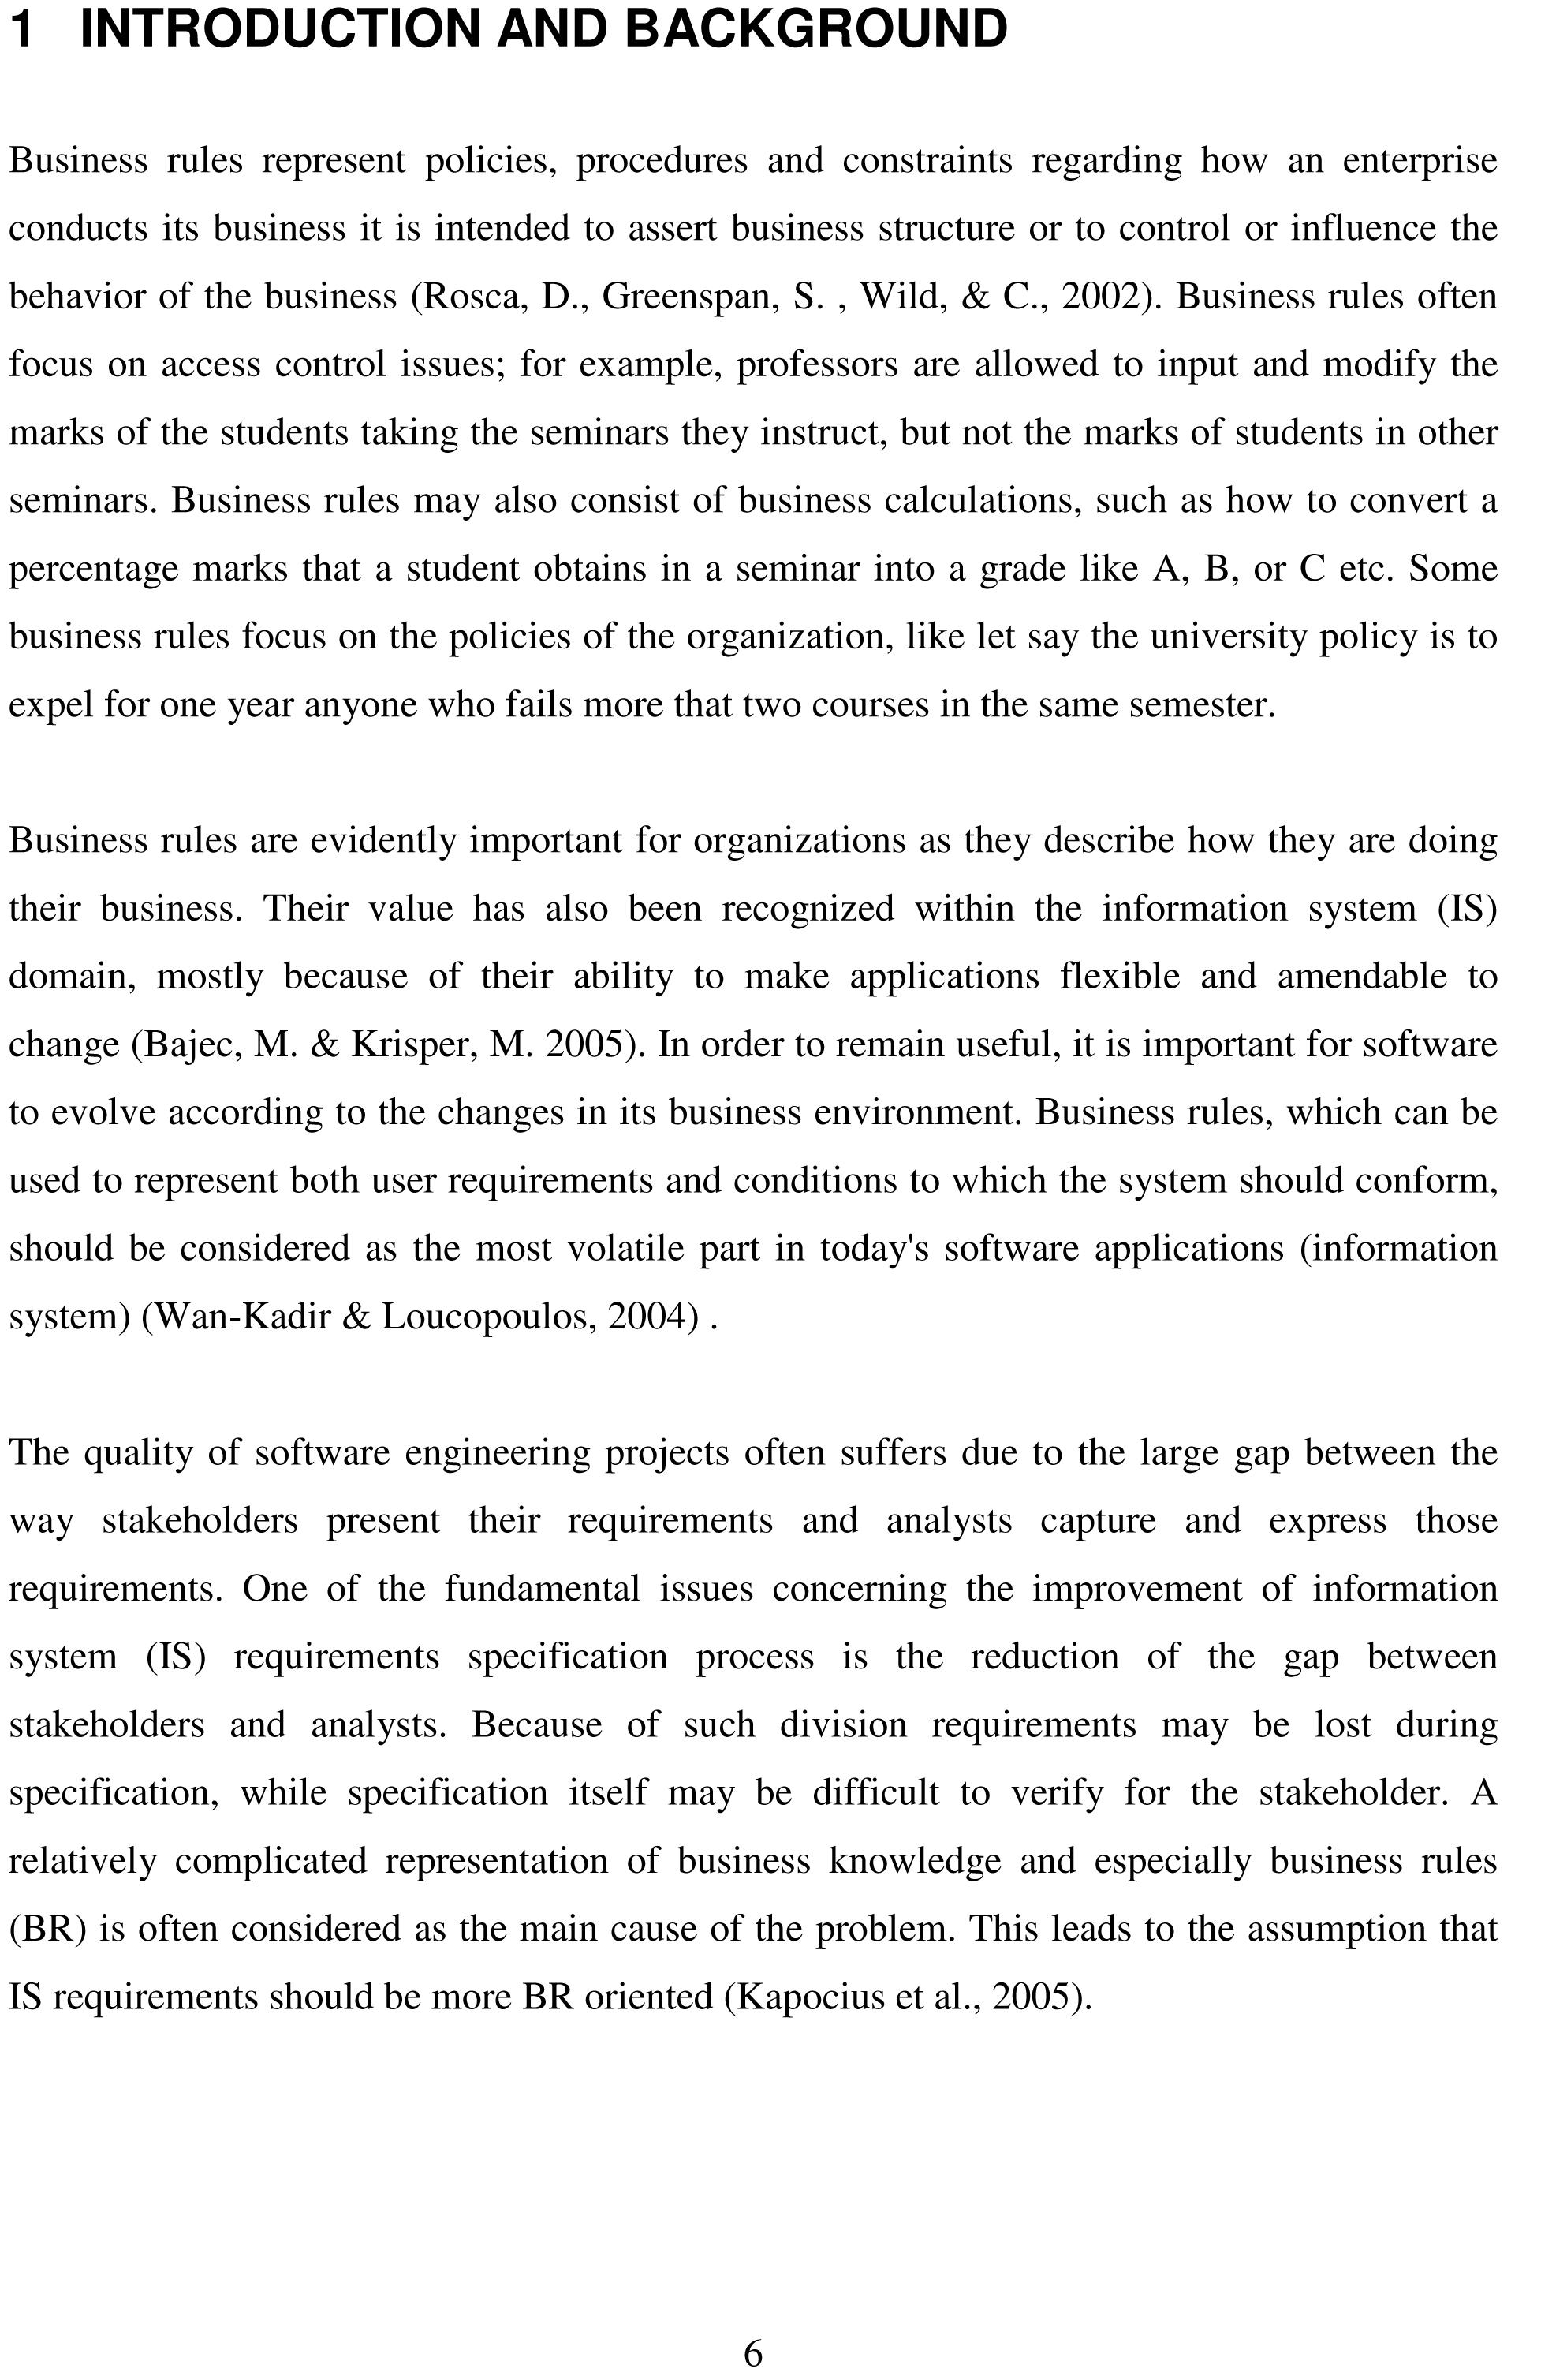 012 Essay Example Sample Act Essays Thesis Wonderful New Full